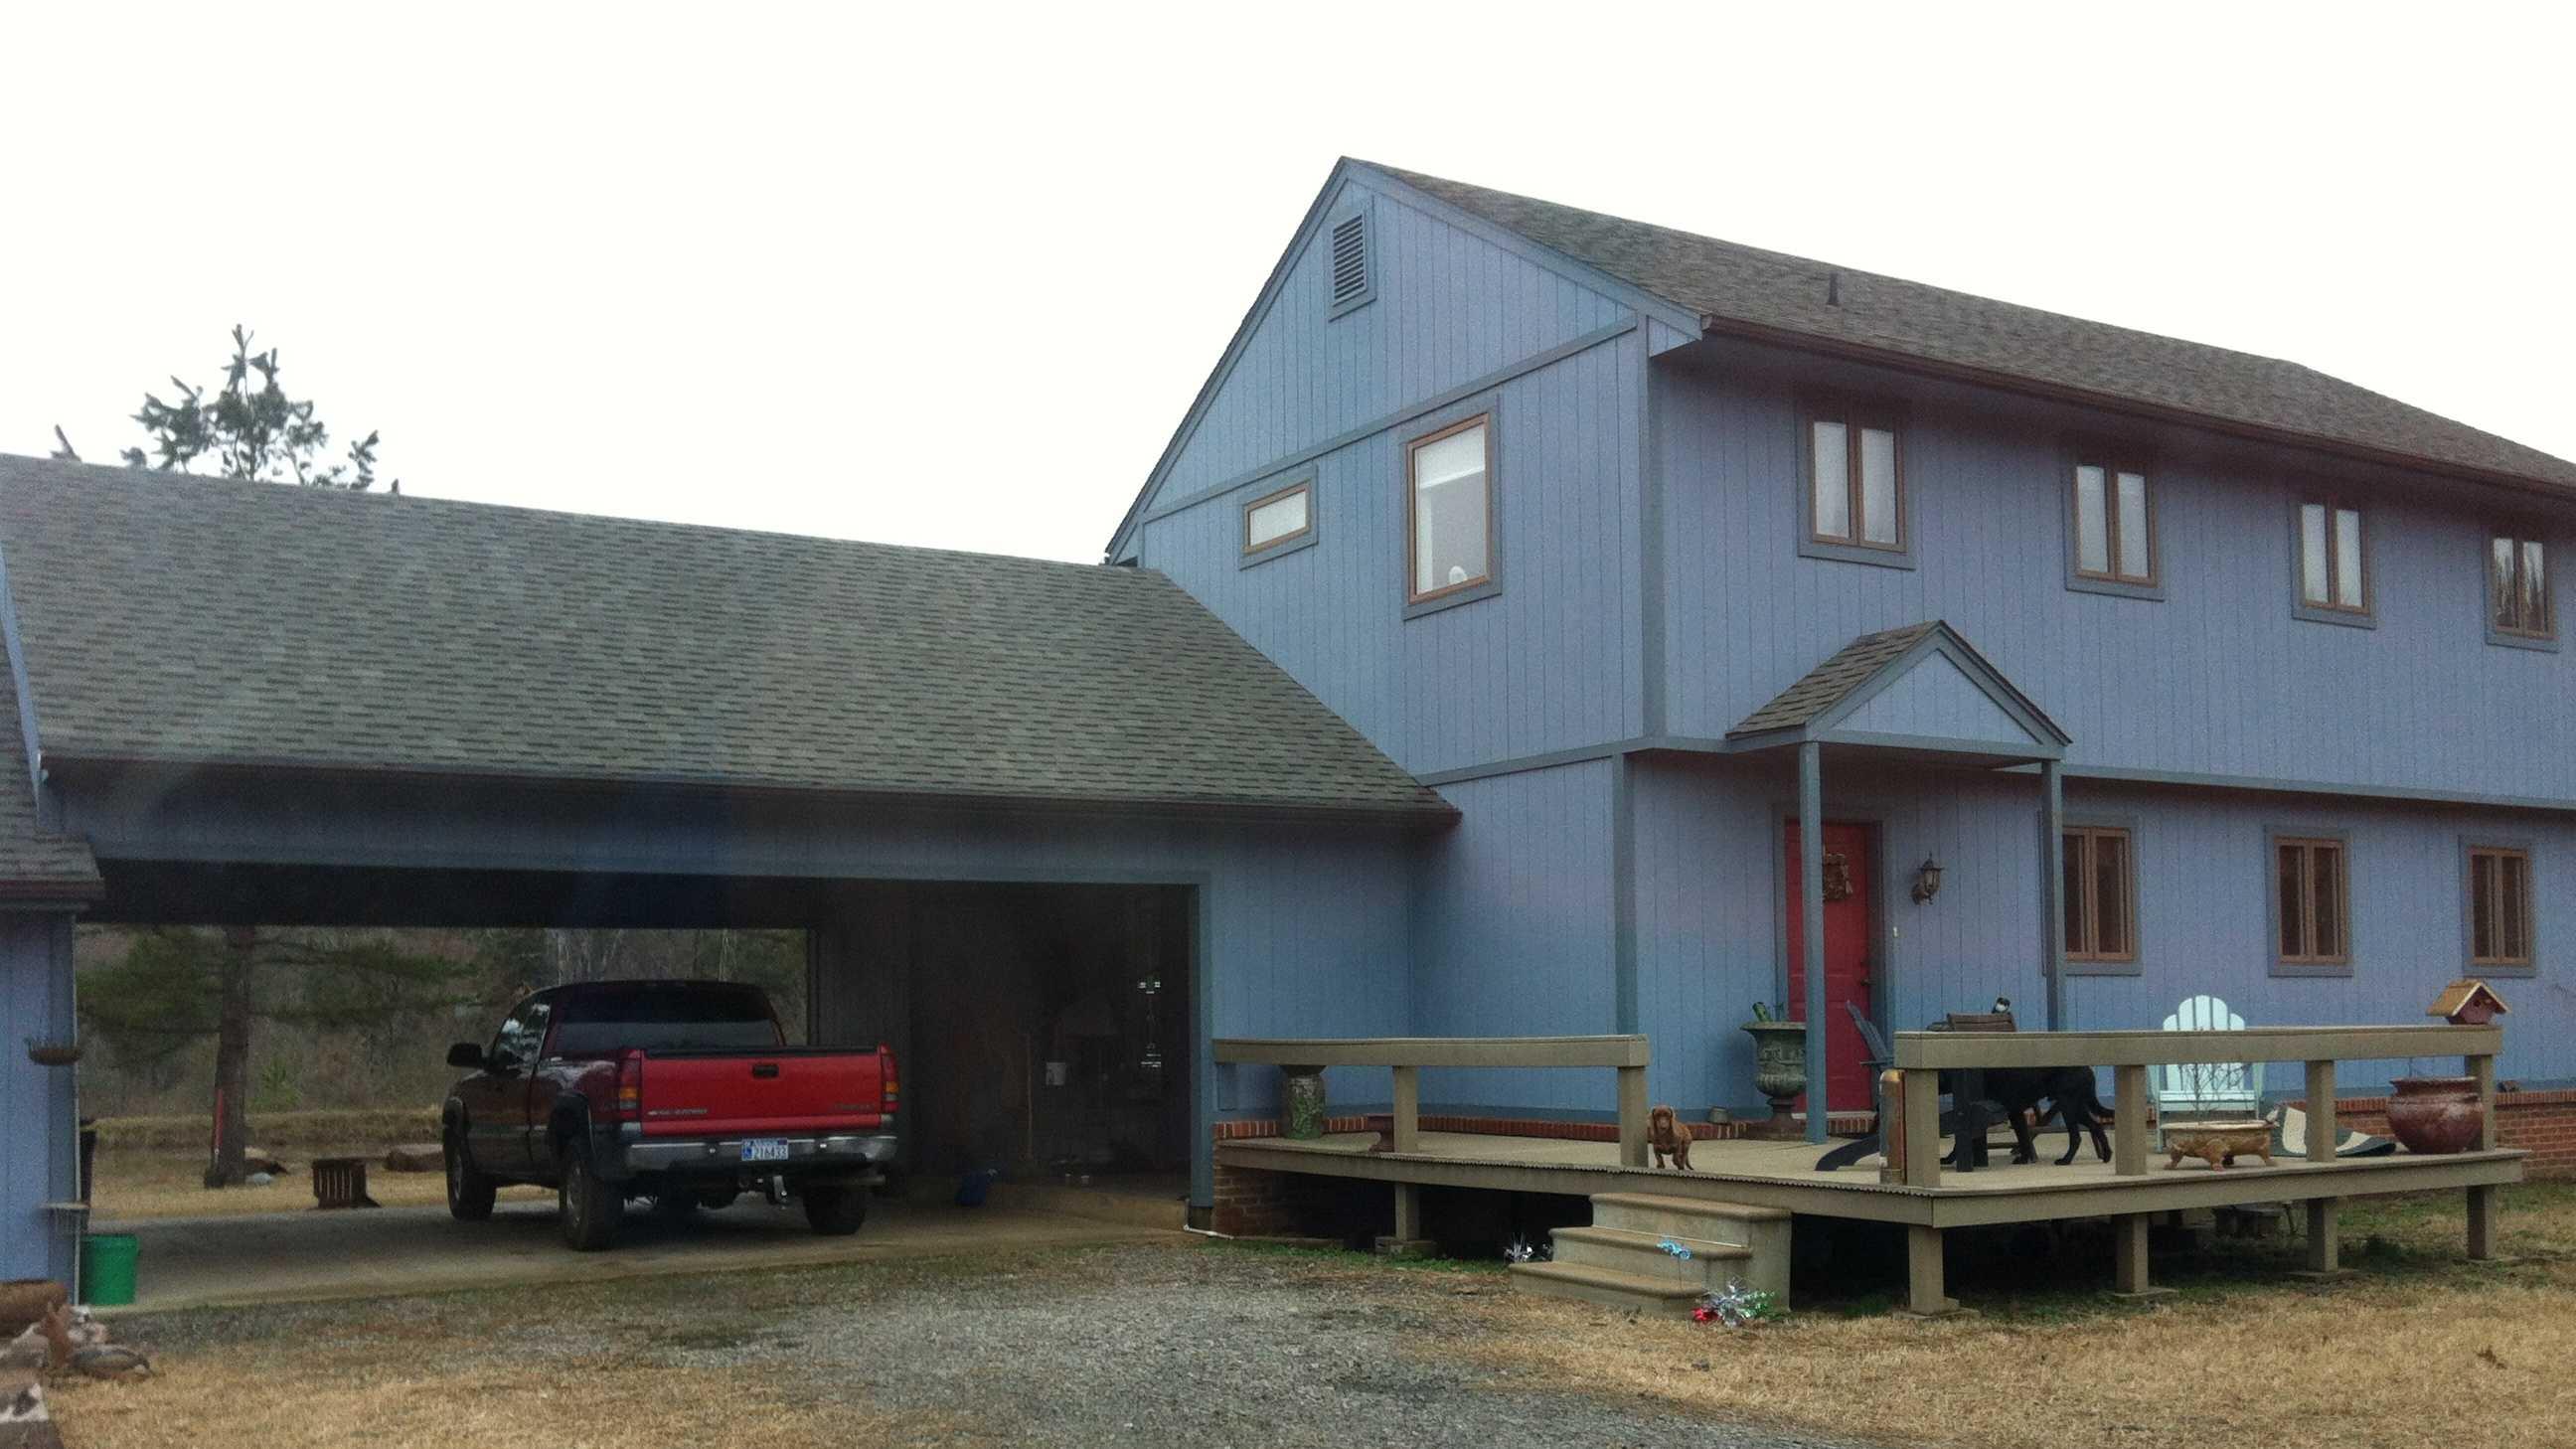 Sebastian County home invasion house